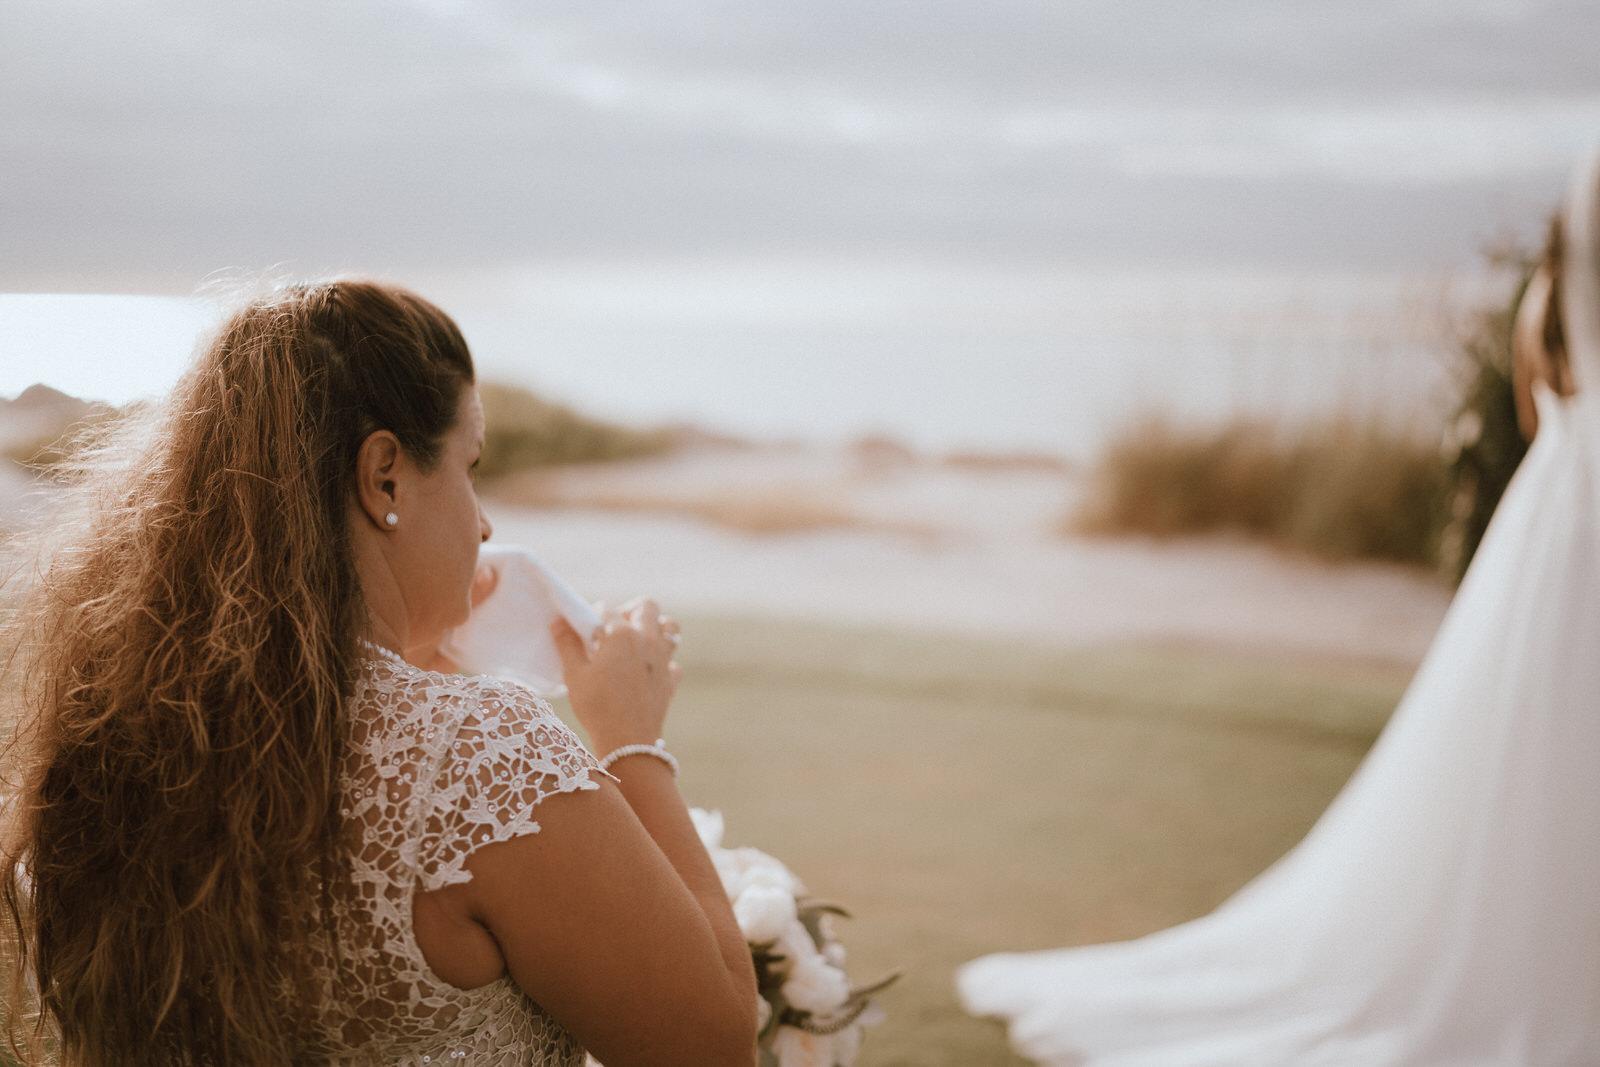 South Seas Island Resort Elopement- Alyana and Shawn- Michelle Gonzalez Photography-444.JPG